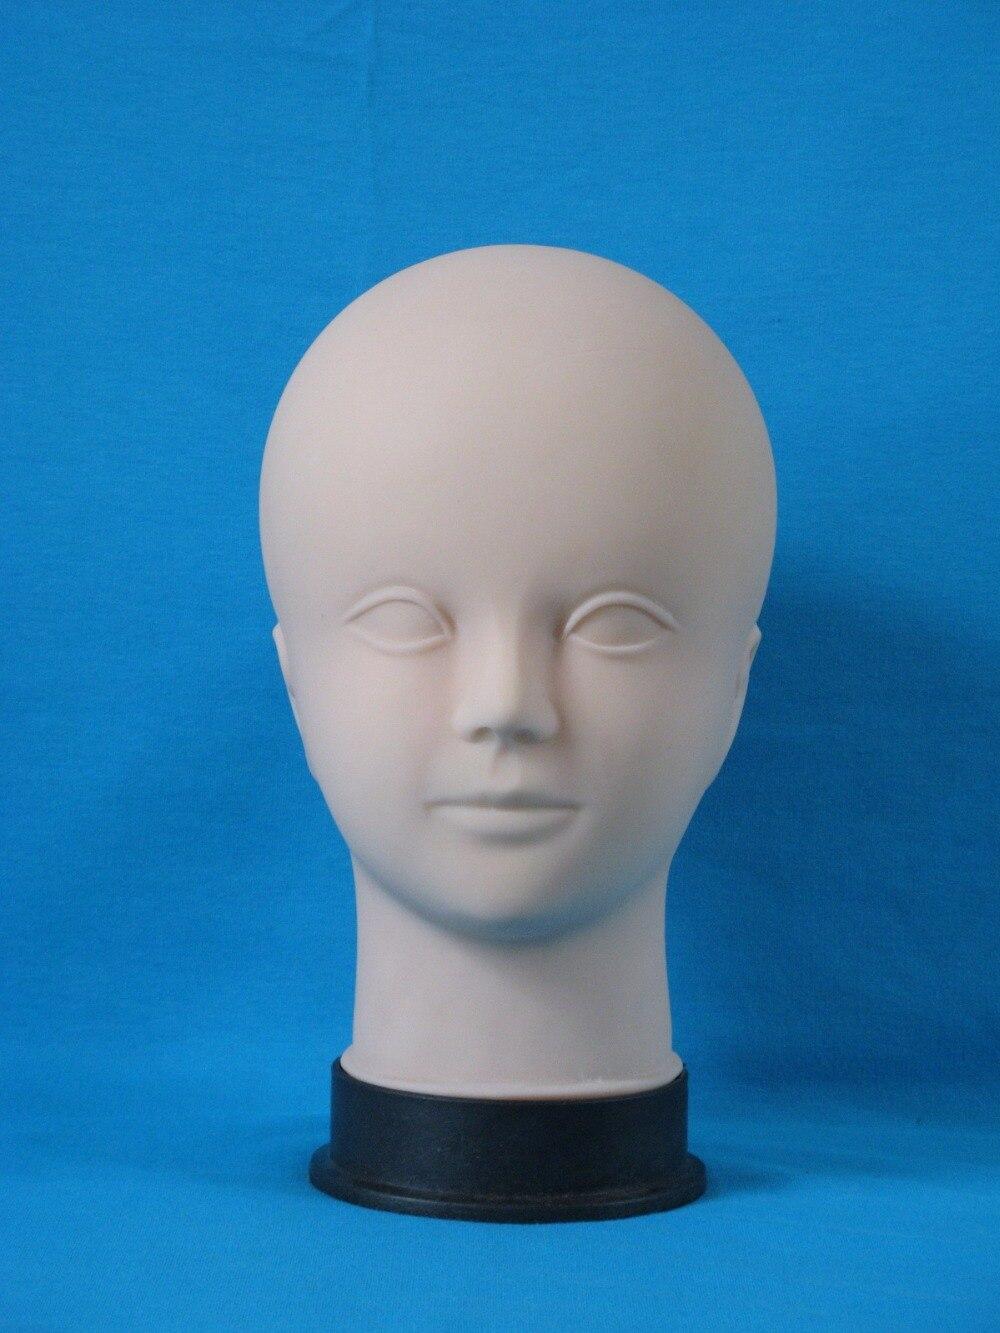 plastic female Cosmetology mannequin head for makeup practice training Manikin hairdresser